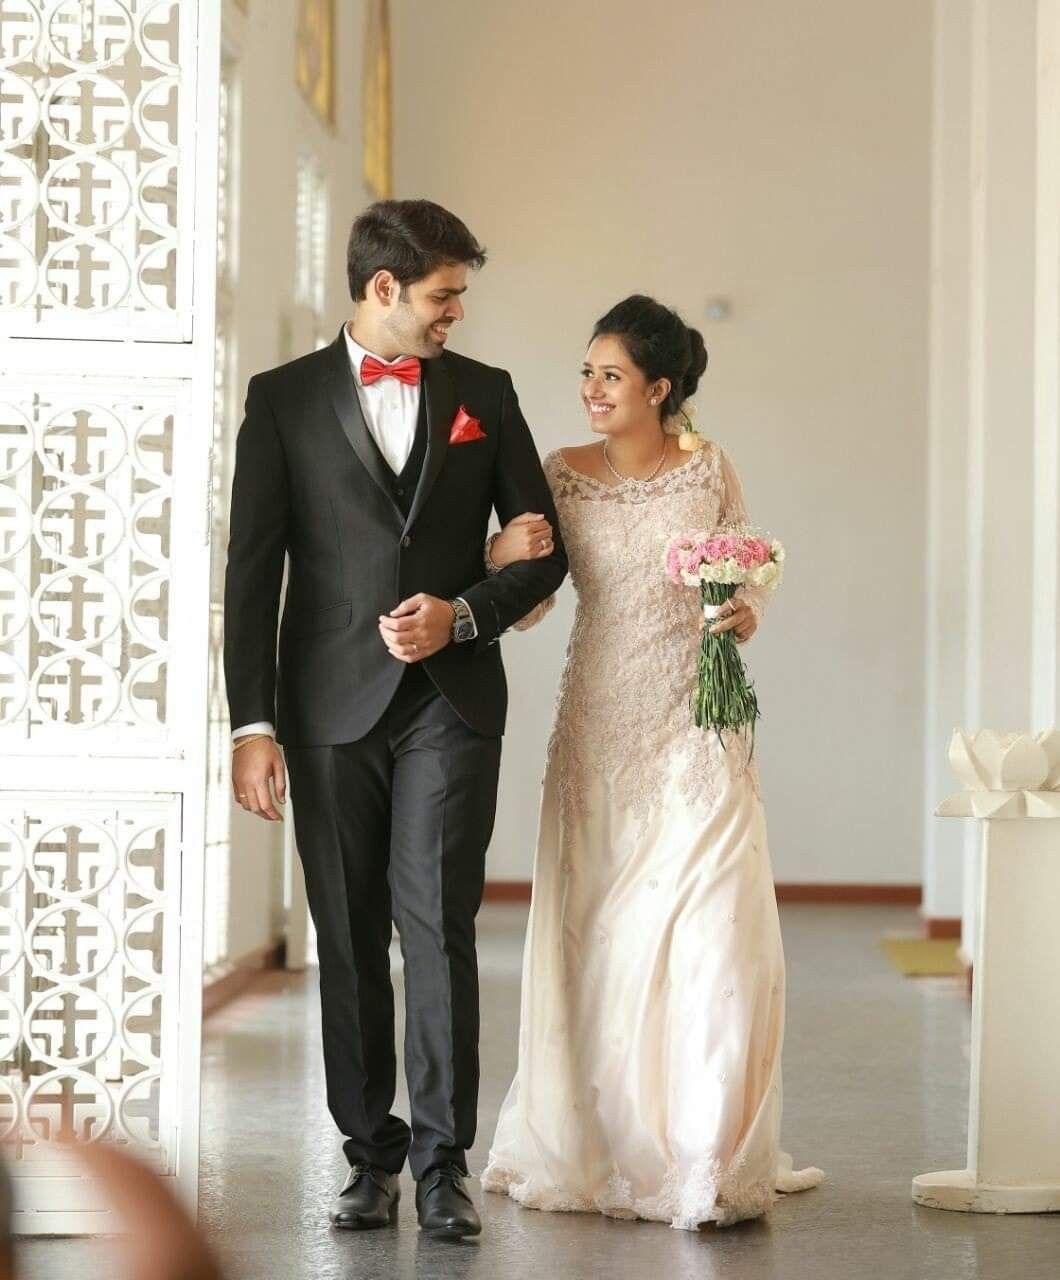 Christian Wedding Reception Ideas: Pin By Sruthi Baiju On Christian Wedding Attire